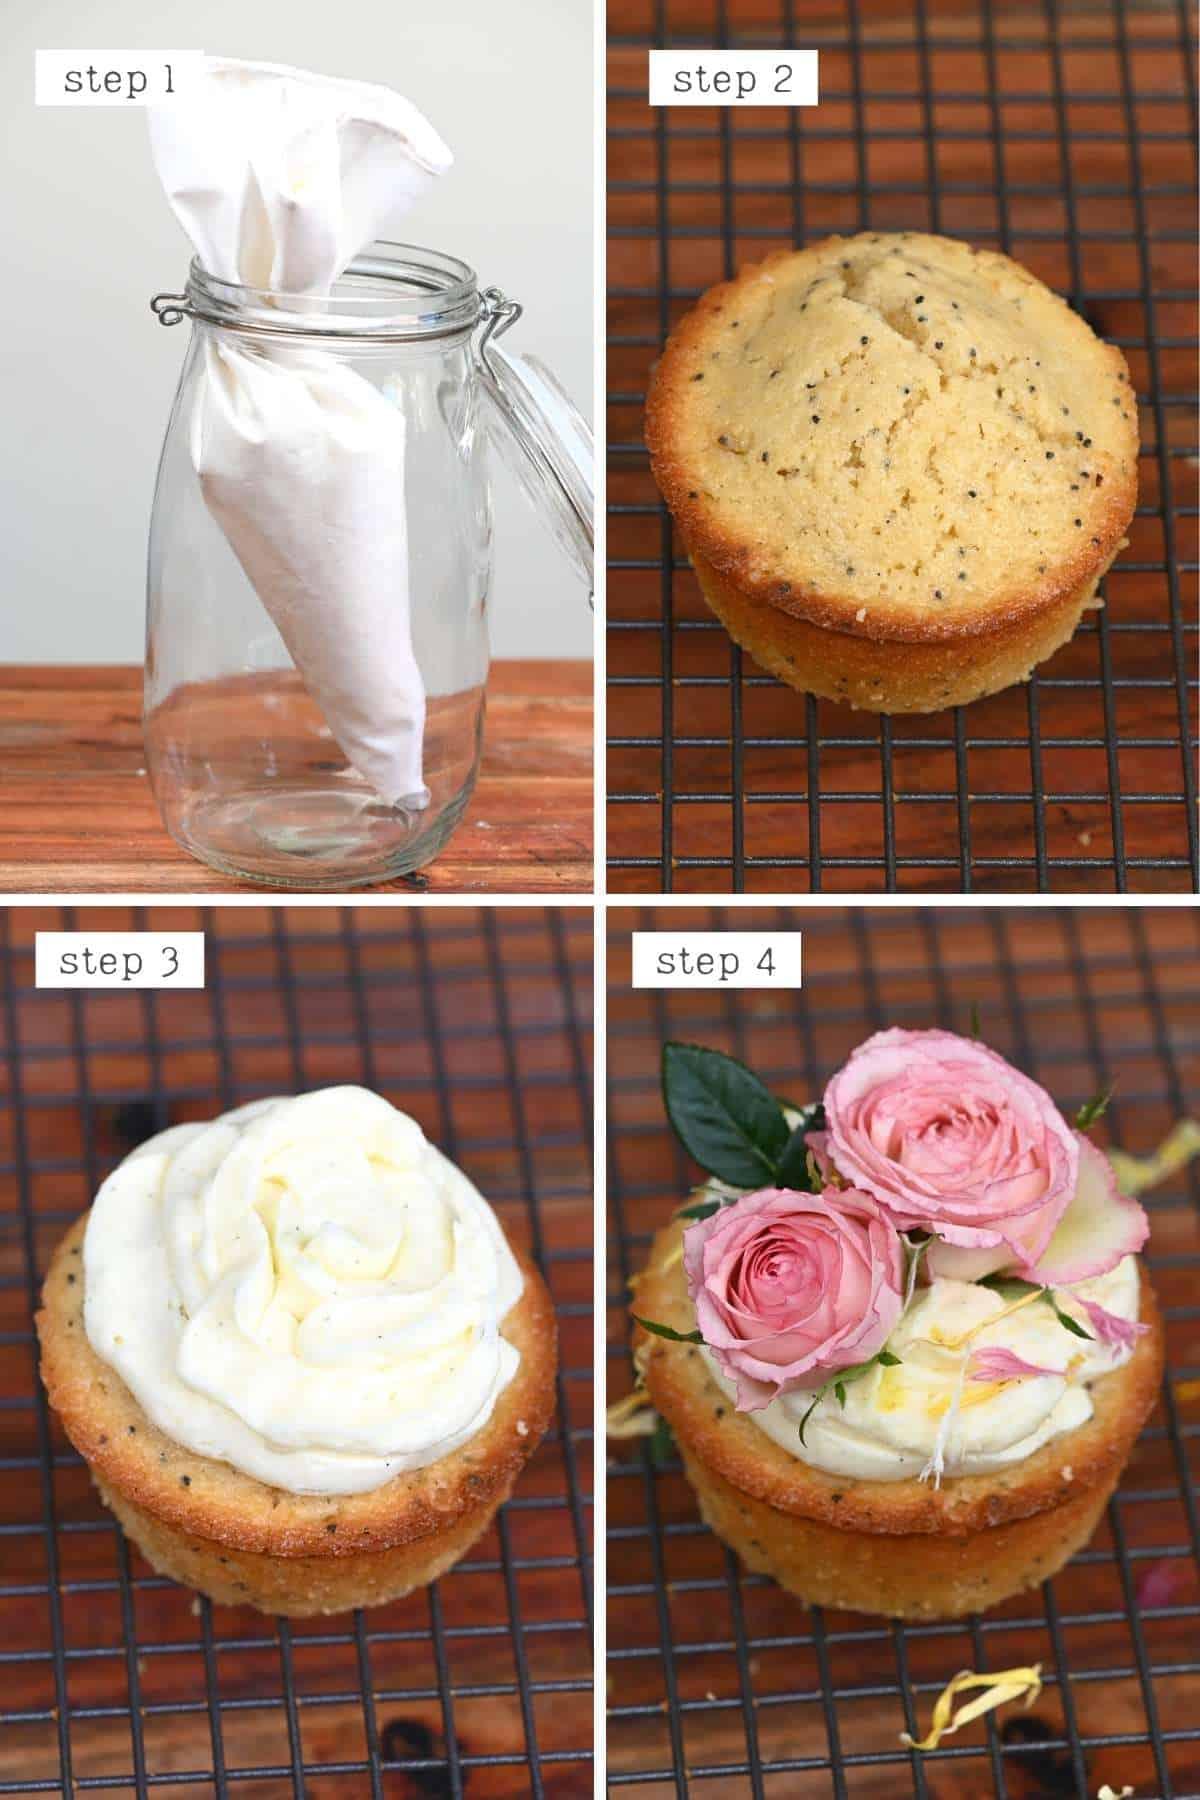 Steps for decorating lemon cupcakes